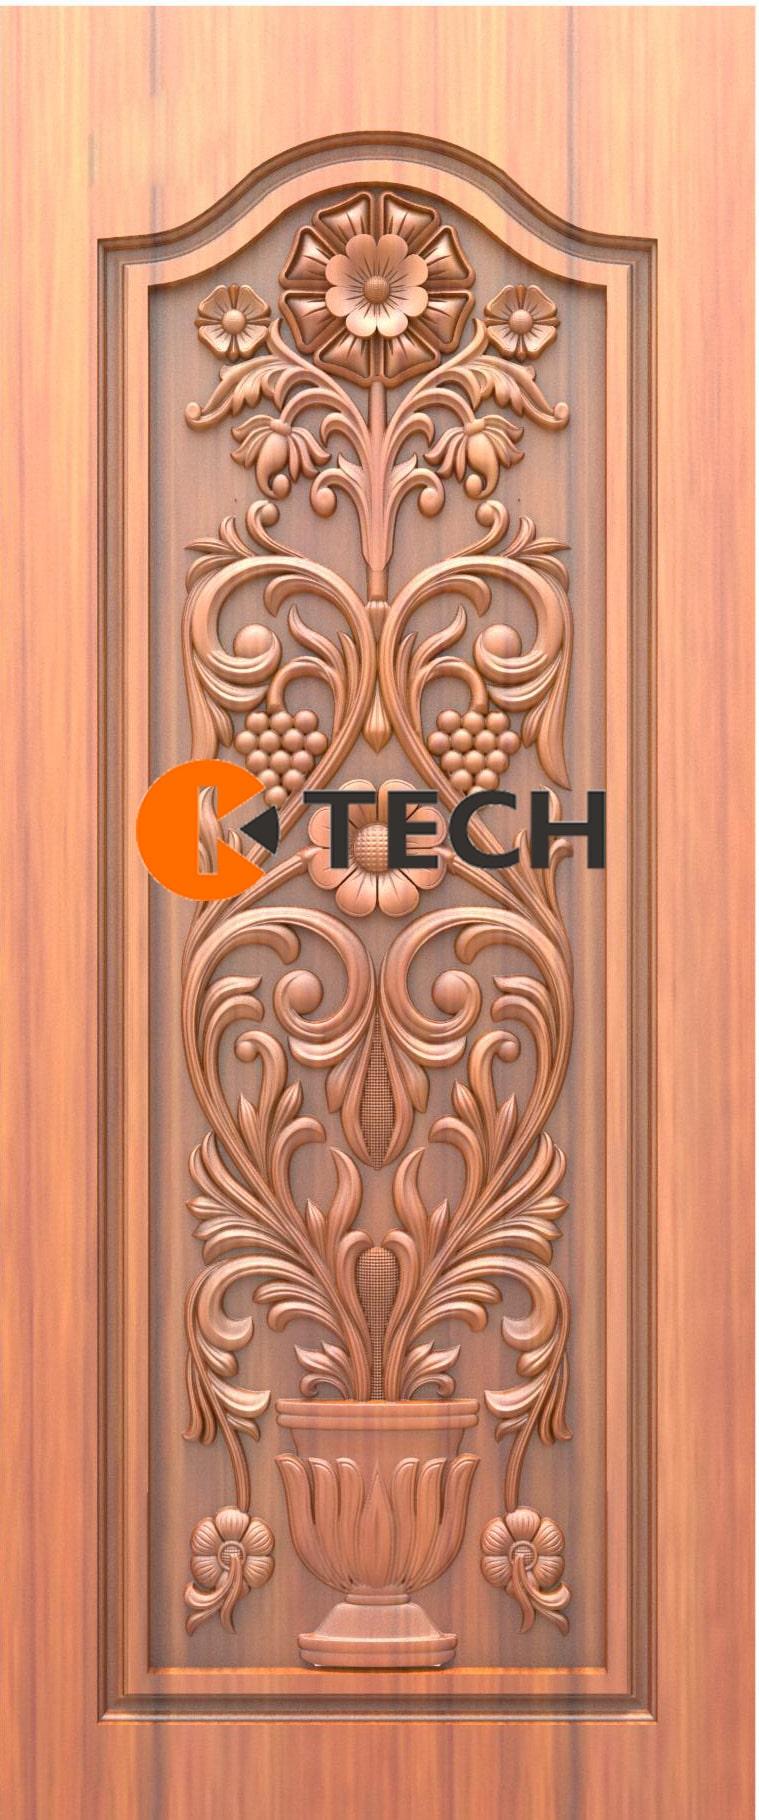 K-TECH CNC Doors Design 187